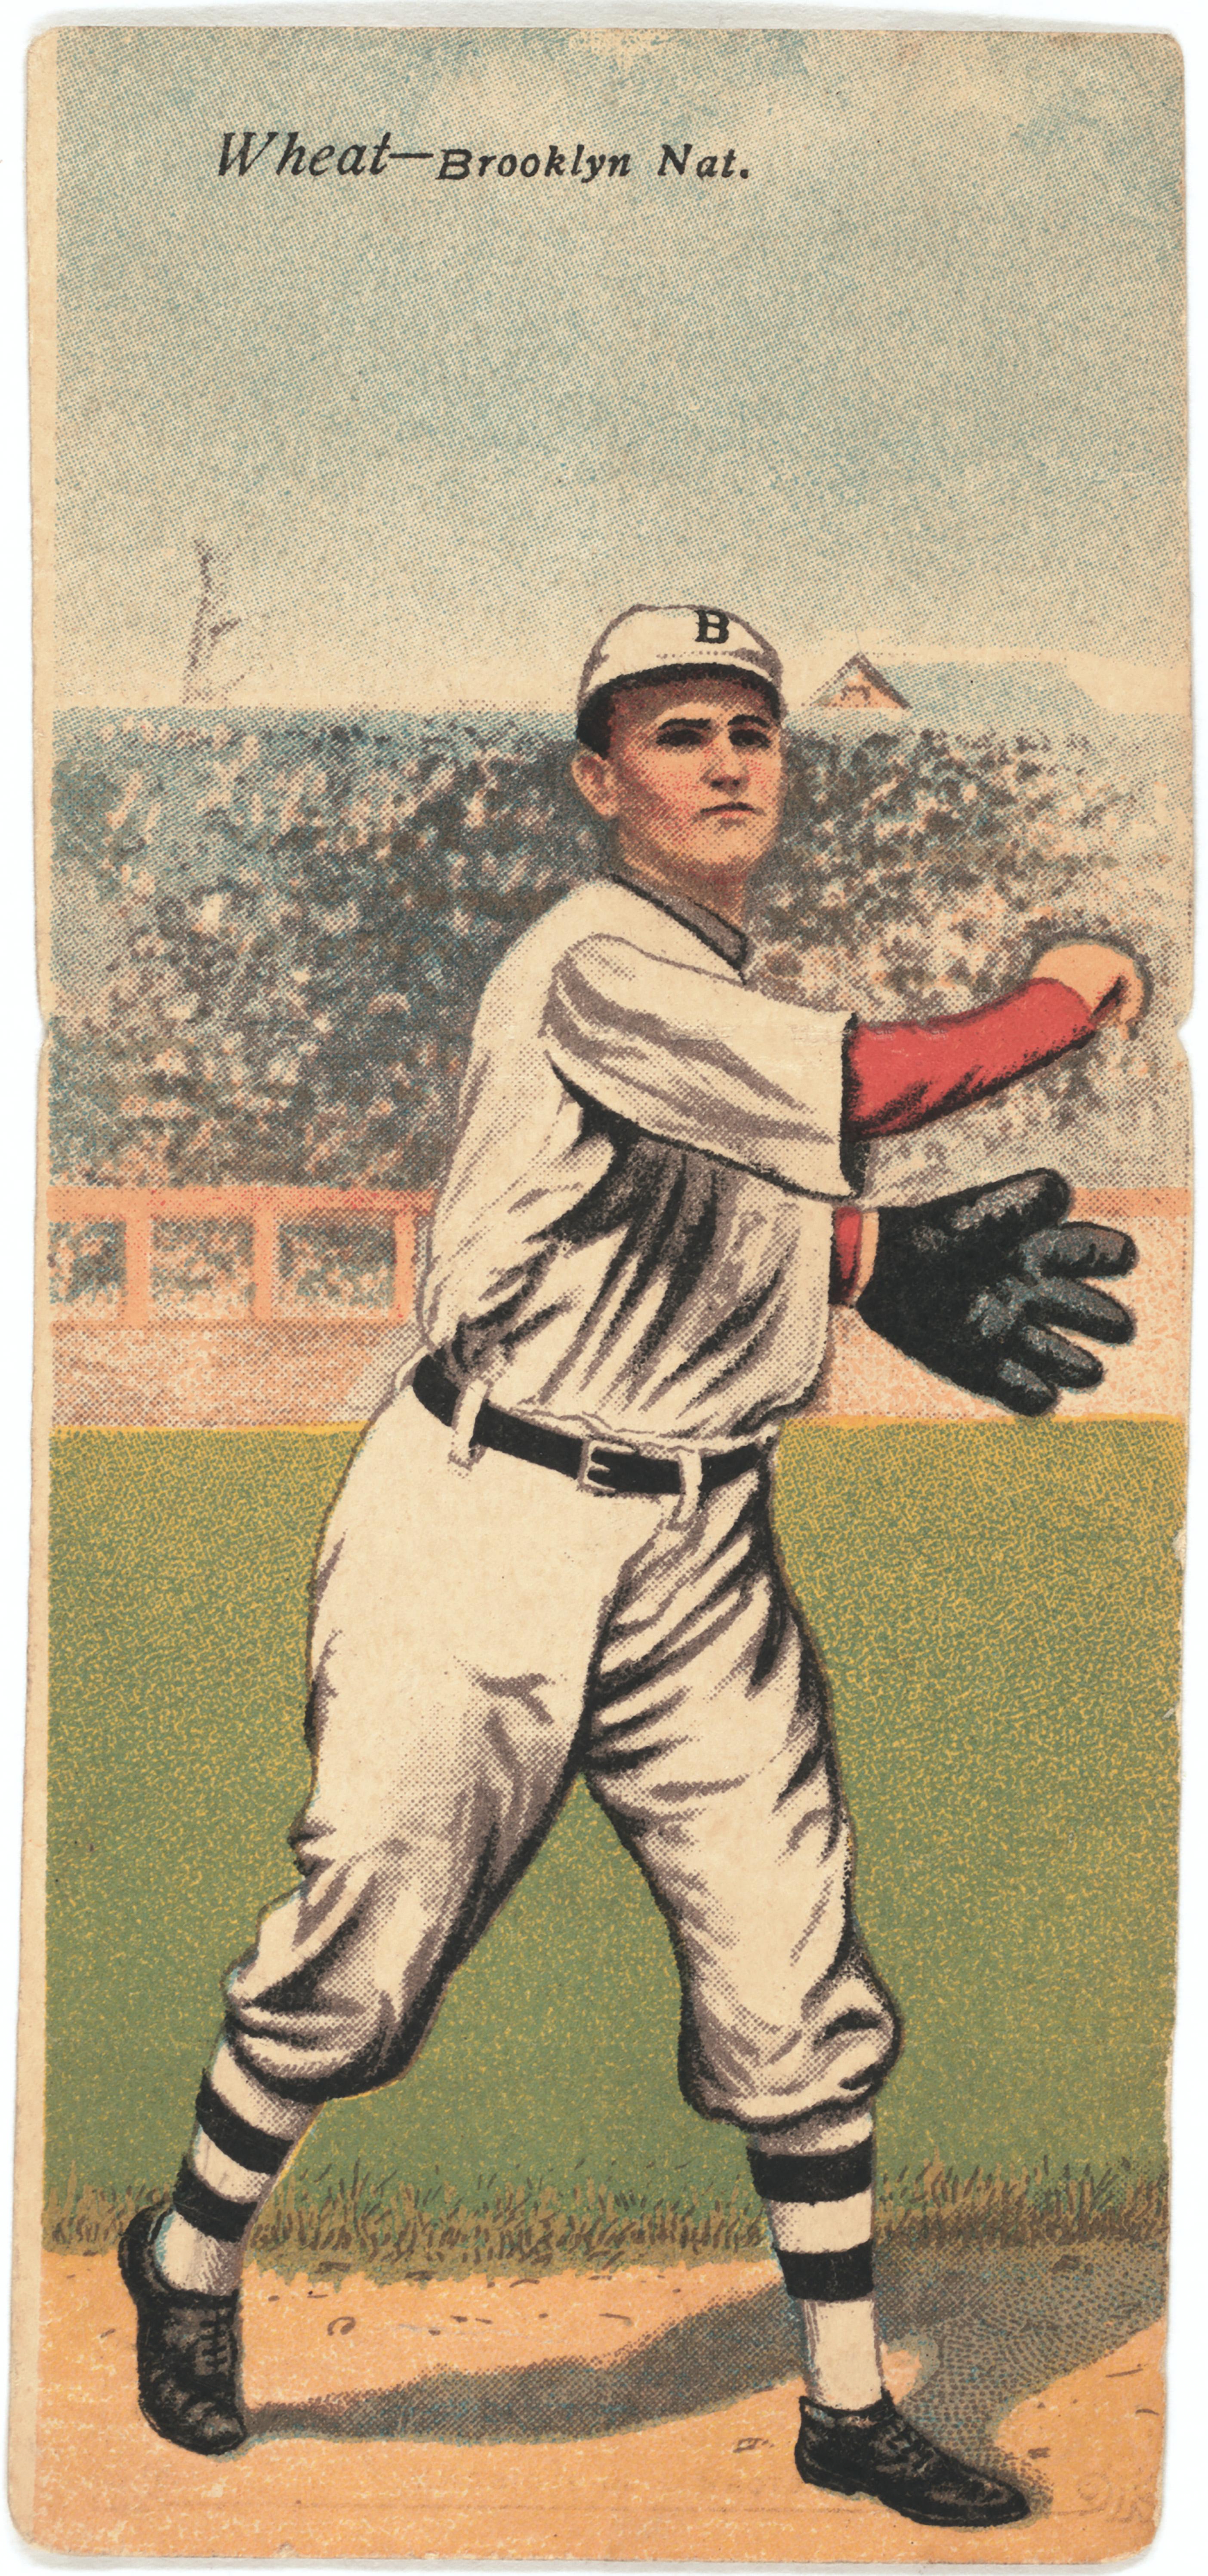 Zack D Wheat, Brooklyn Dodgers, Baseball Card Portrait, American Tobacco Company, 1911